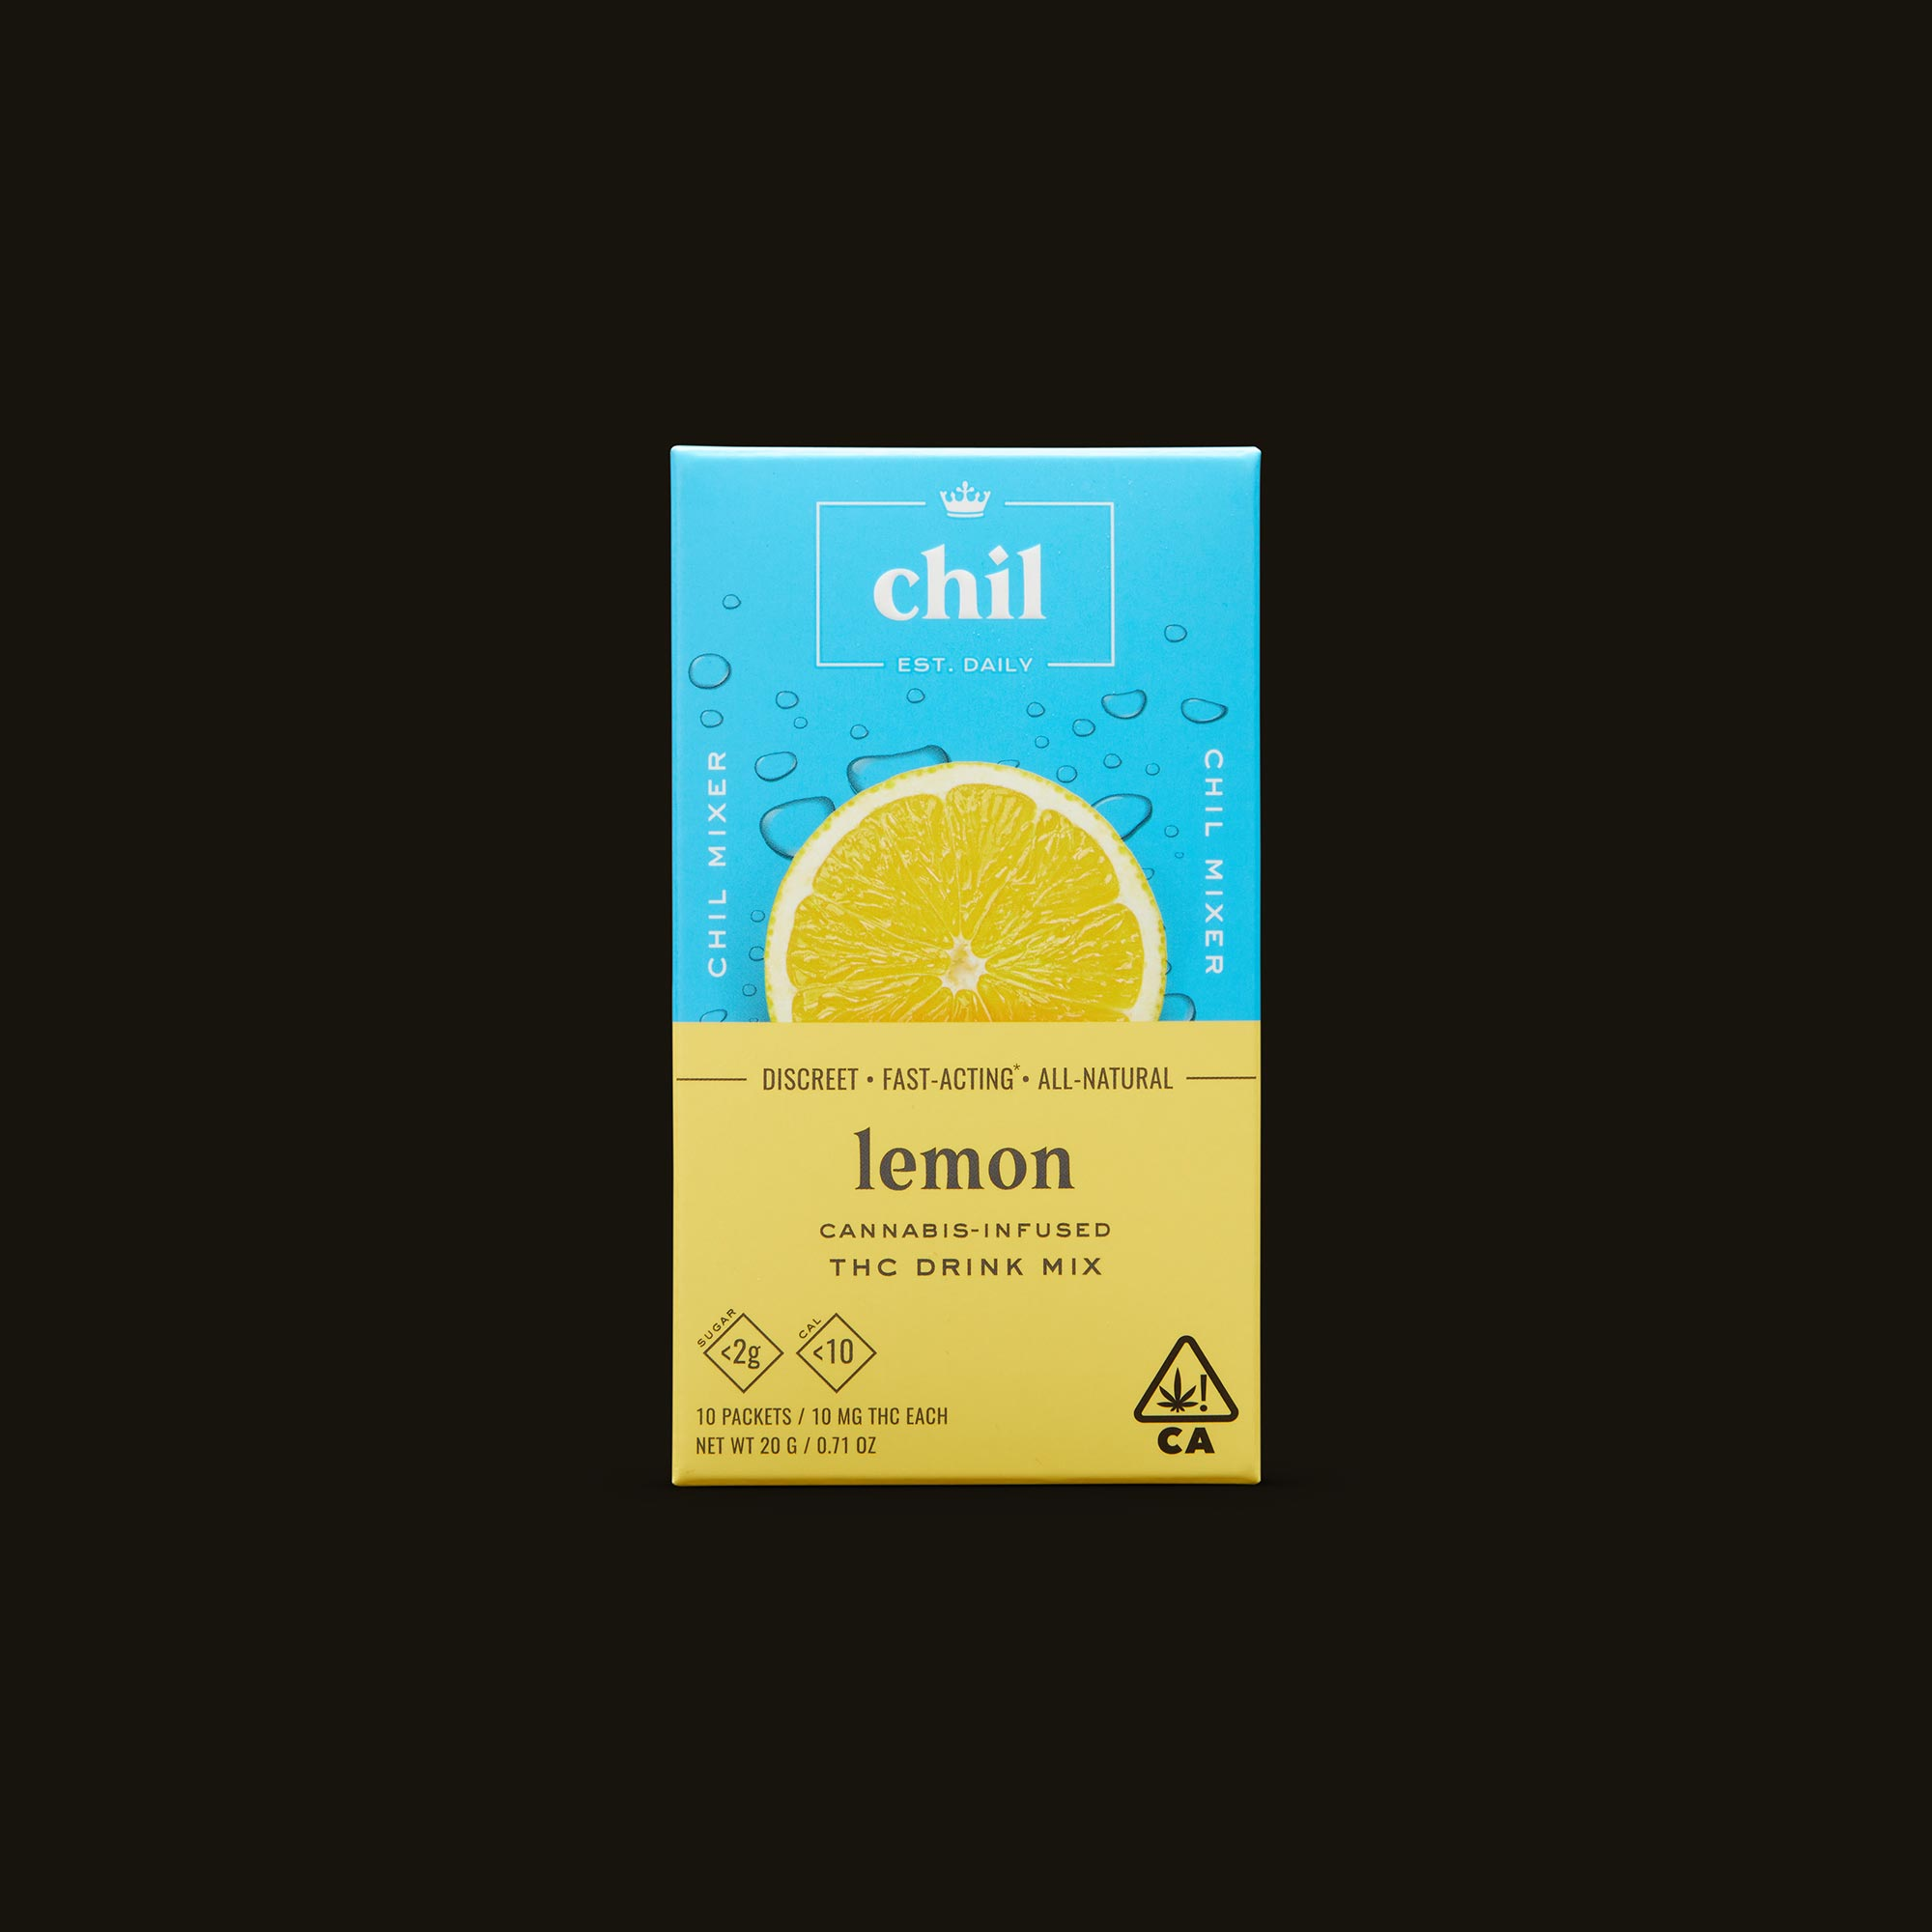 Chil Lemon Mixer Front Box